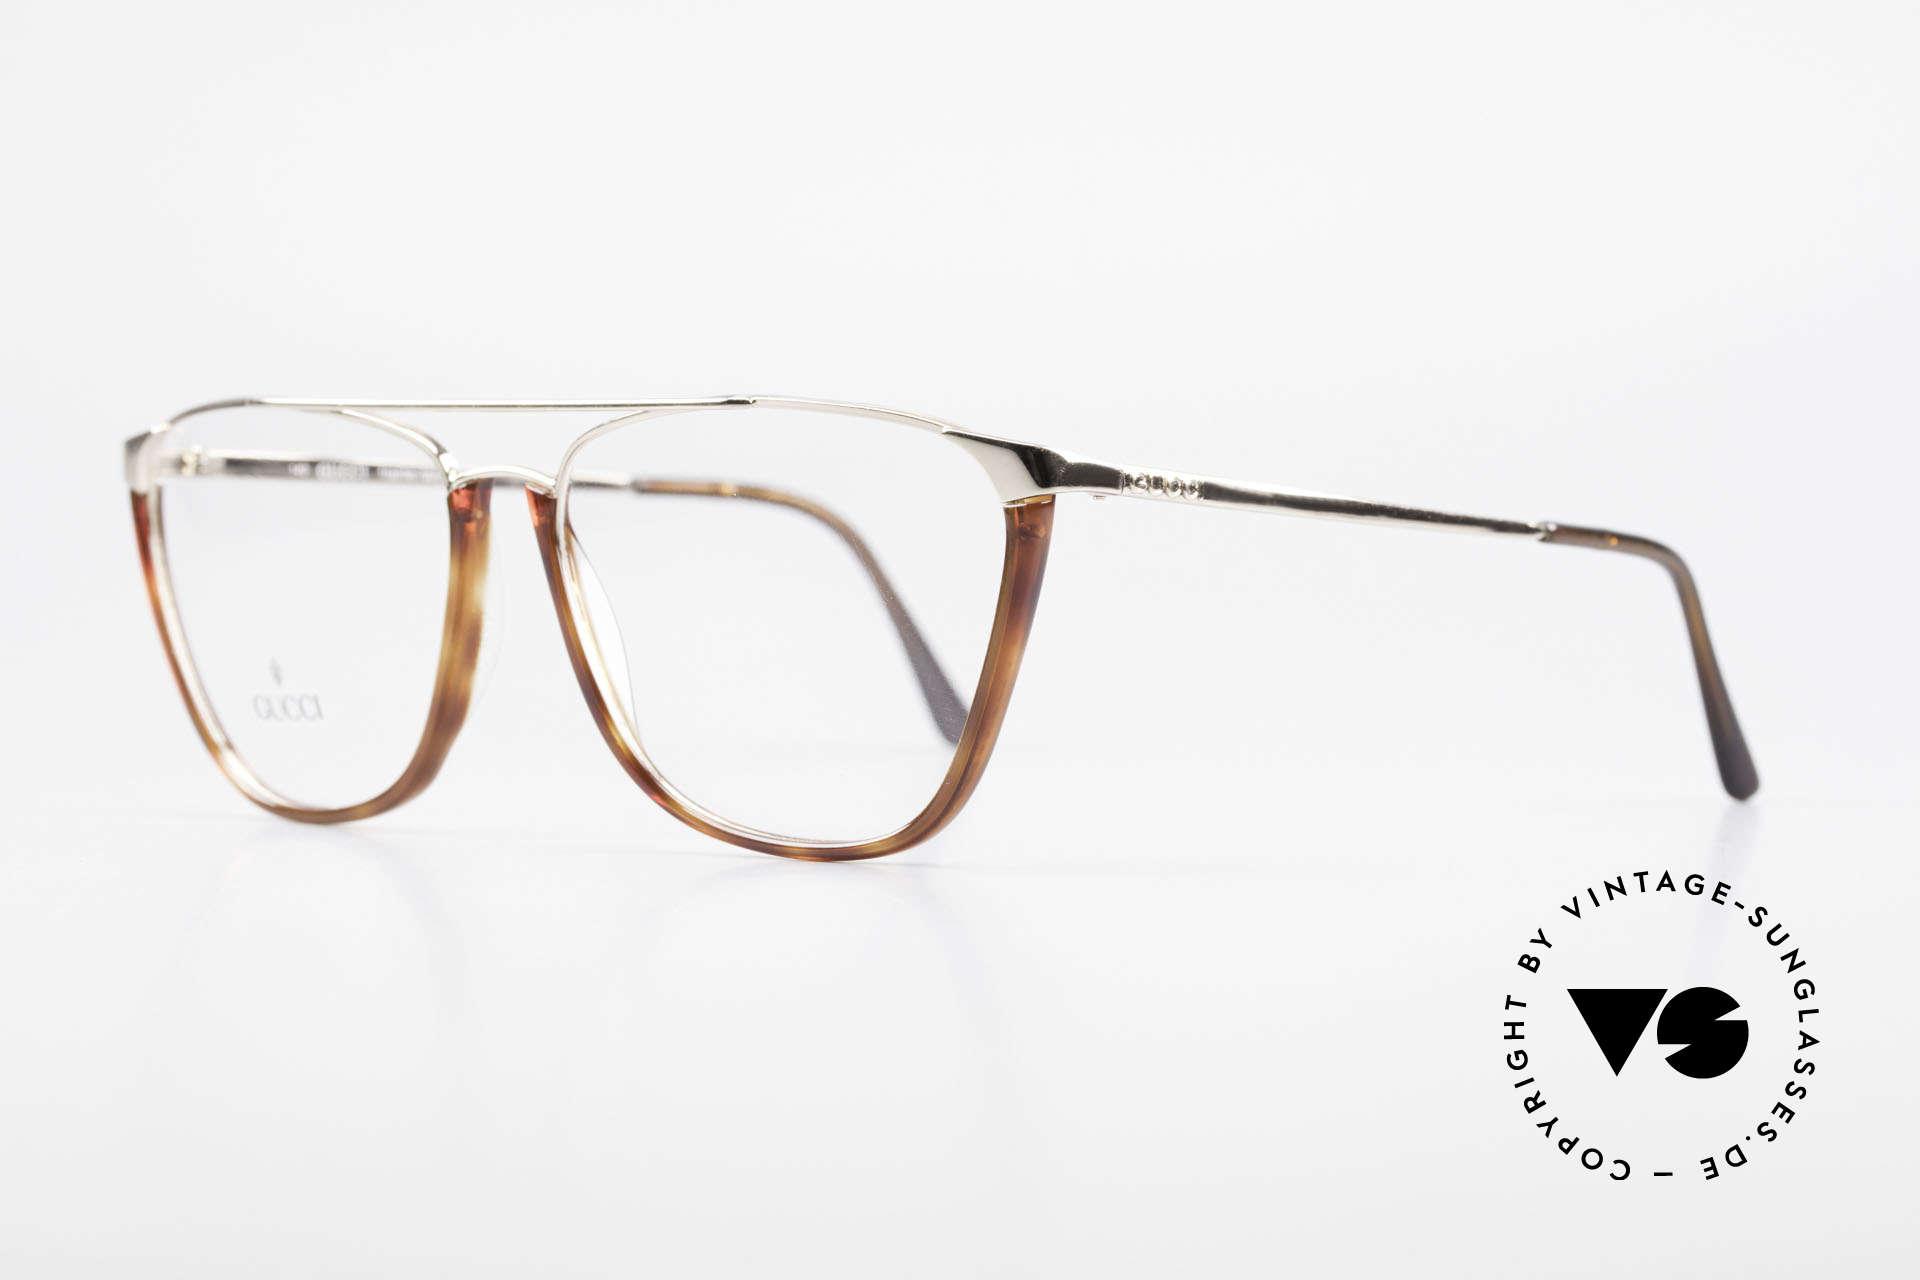 Gucci 1308 90's Designer Eyeglass-Frame, noble timeless design (gold-plated / tortoise), Made for Men and Women